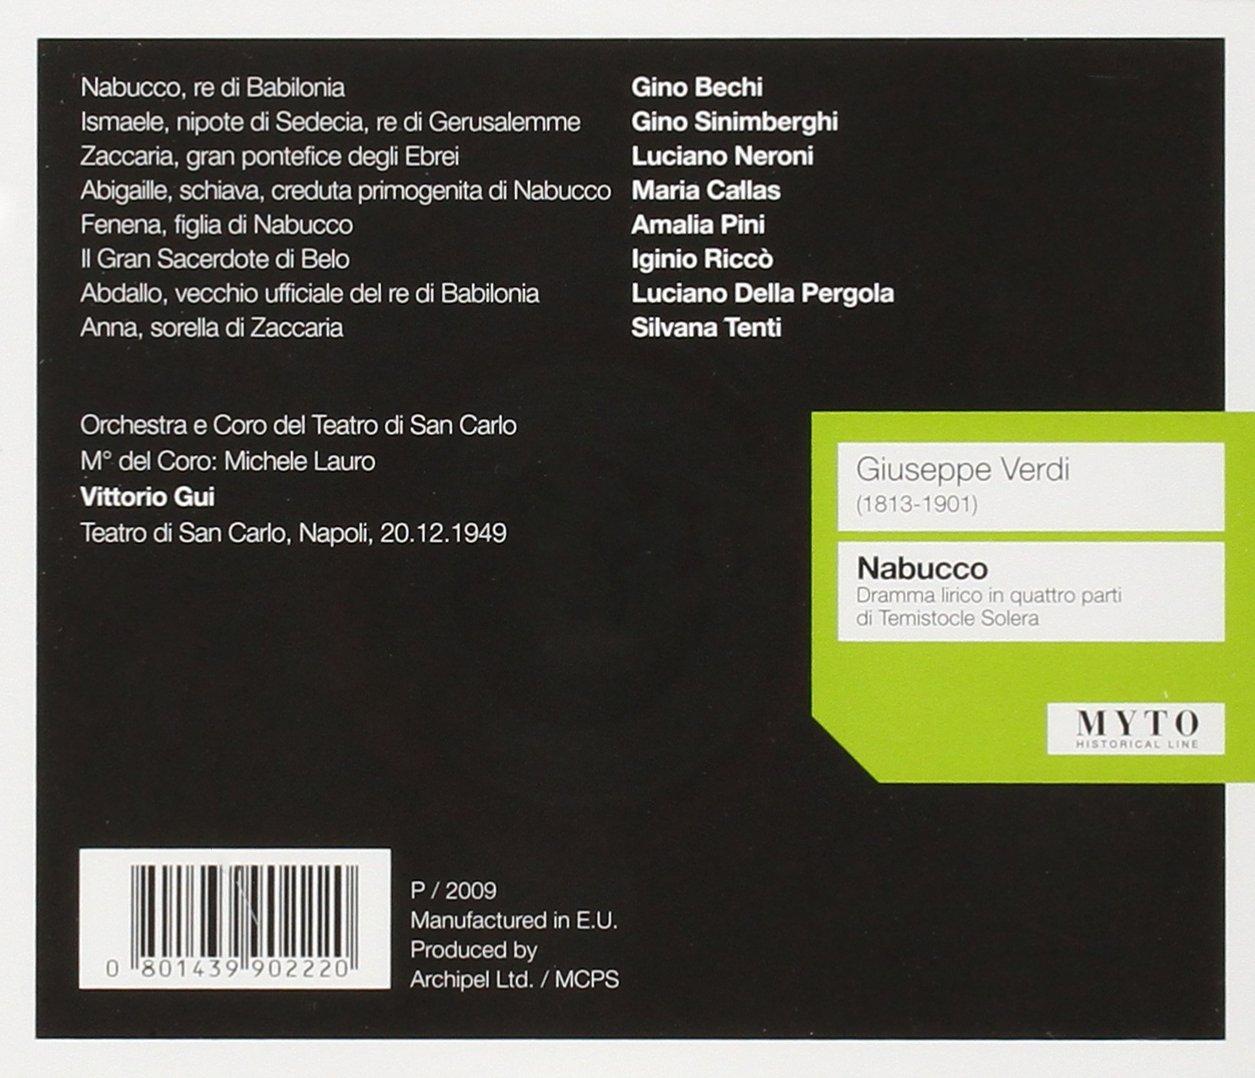 Nabucco Grabacion Completa 1949: Callas/Sinimberghi/Neroni/Pini/San Carlo Neapel, VERDI: Amazon.es: Música